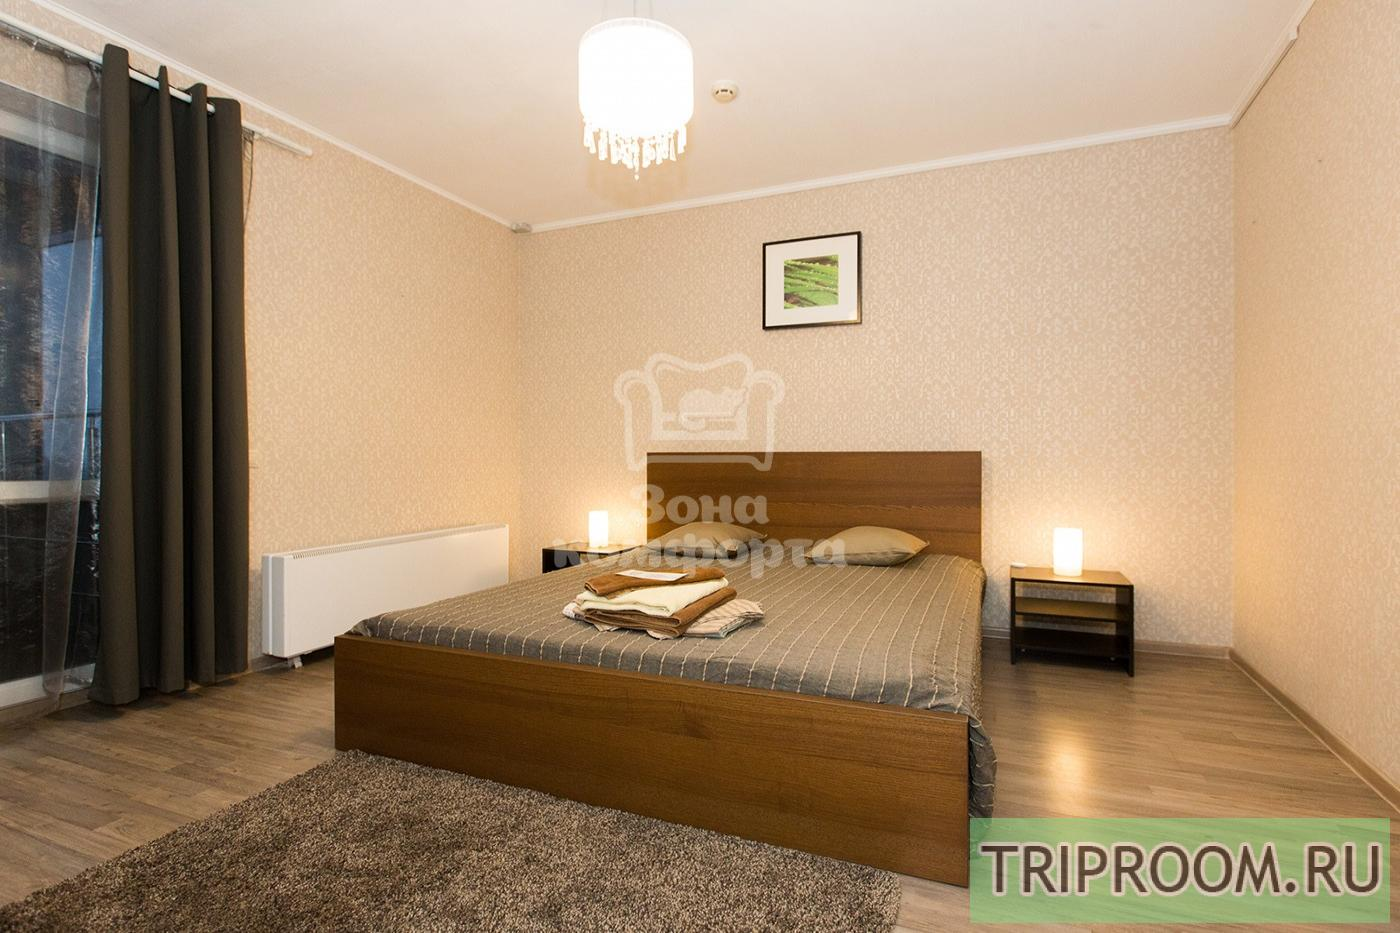 2-комнатная квартира посуточно (вариант № 34715), ул. Гагарина бульвар, фото № 5